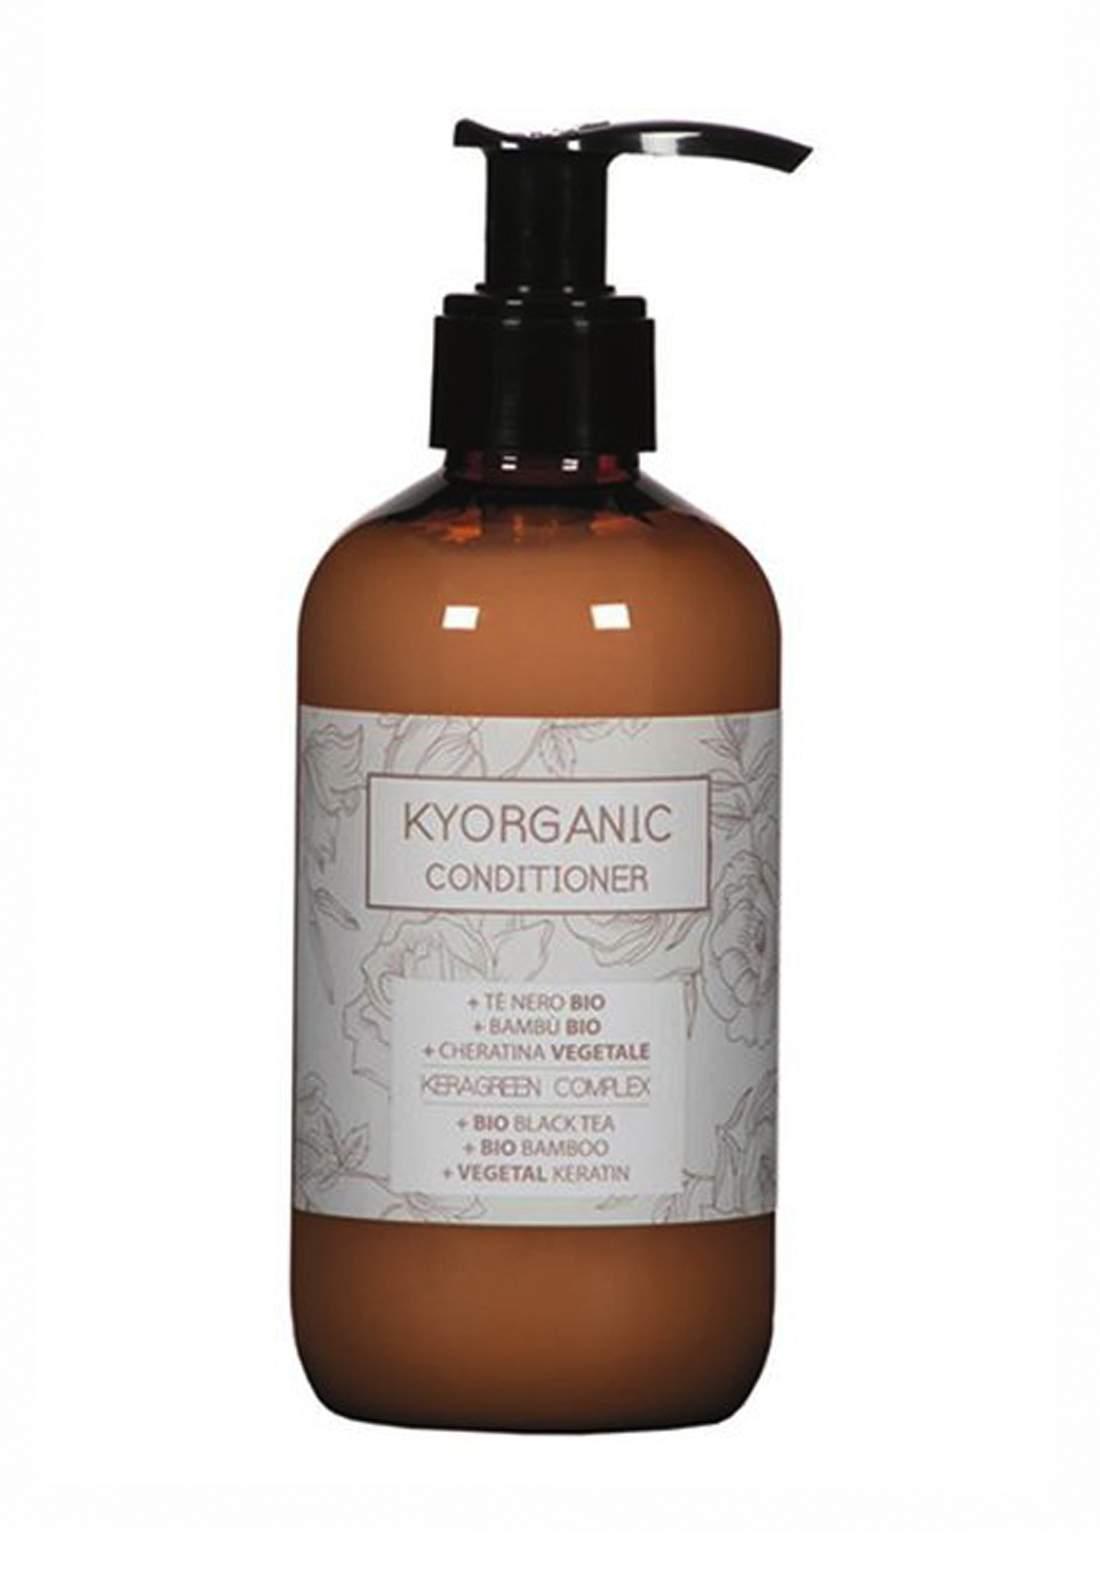 Kyo Kyorganic Conditioner 250 mlبلسم شعر - White